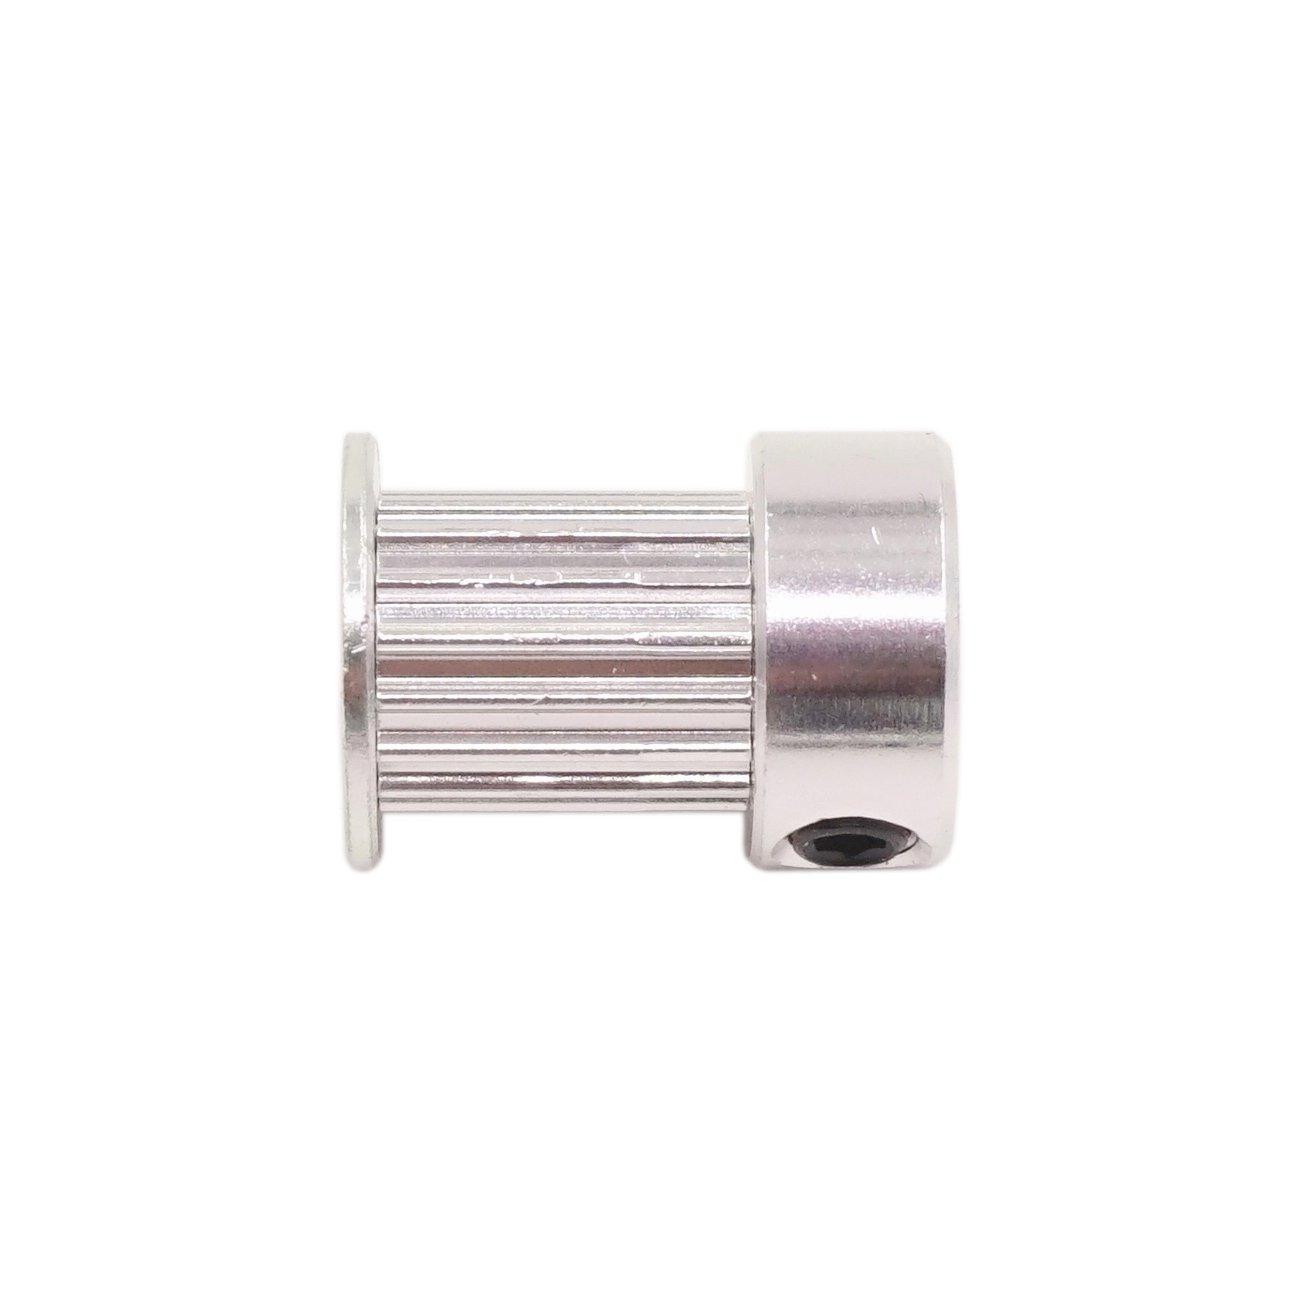 Pack of 5Pcs RepRap Bowden Prusa I3 Mendel Makerbot Kossel Delta WINSINN Aluminum 2GT GT2 Synchronous Wheel 16 Teeth Bore 5mm 16T Timing Pulley For 3D Printer Width 6mm Timing Belt